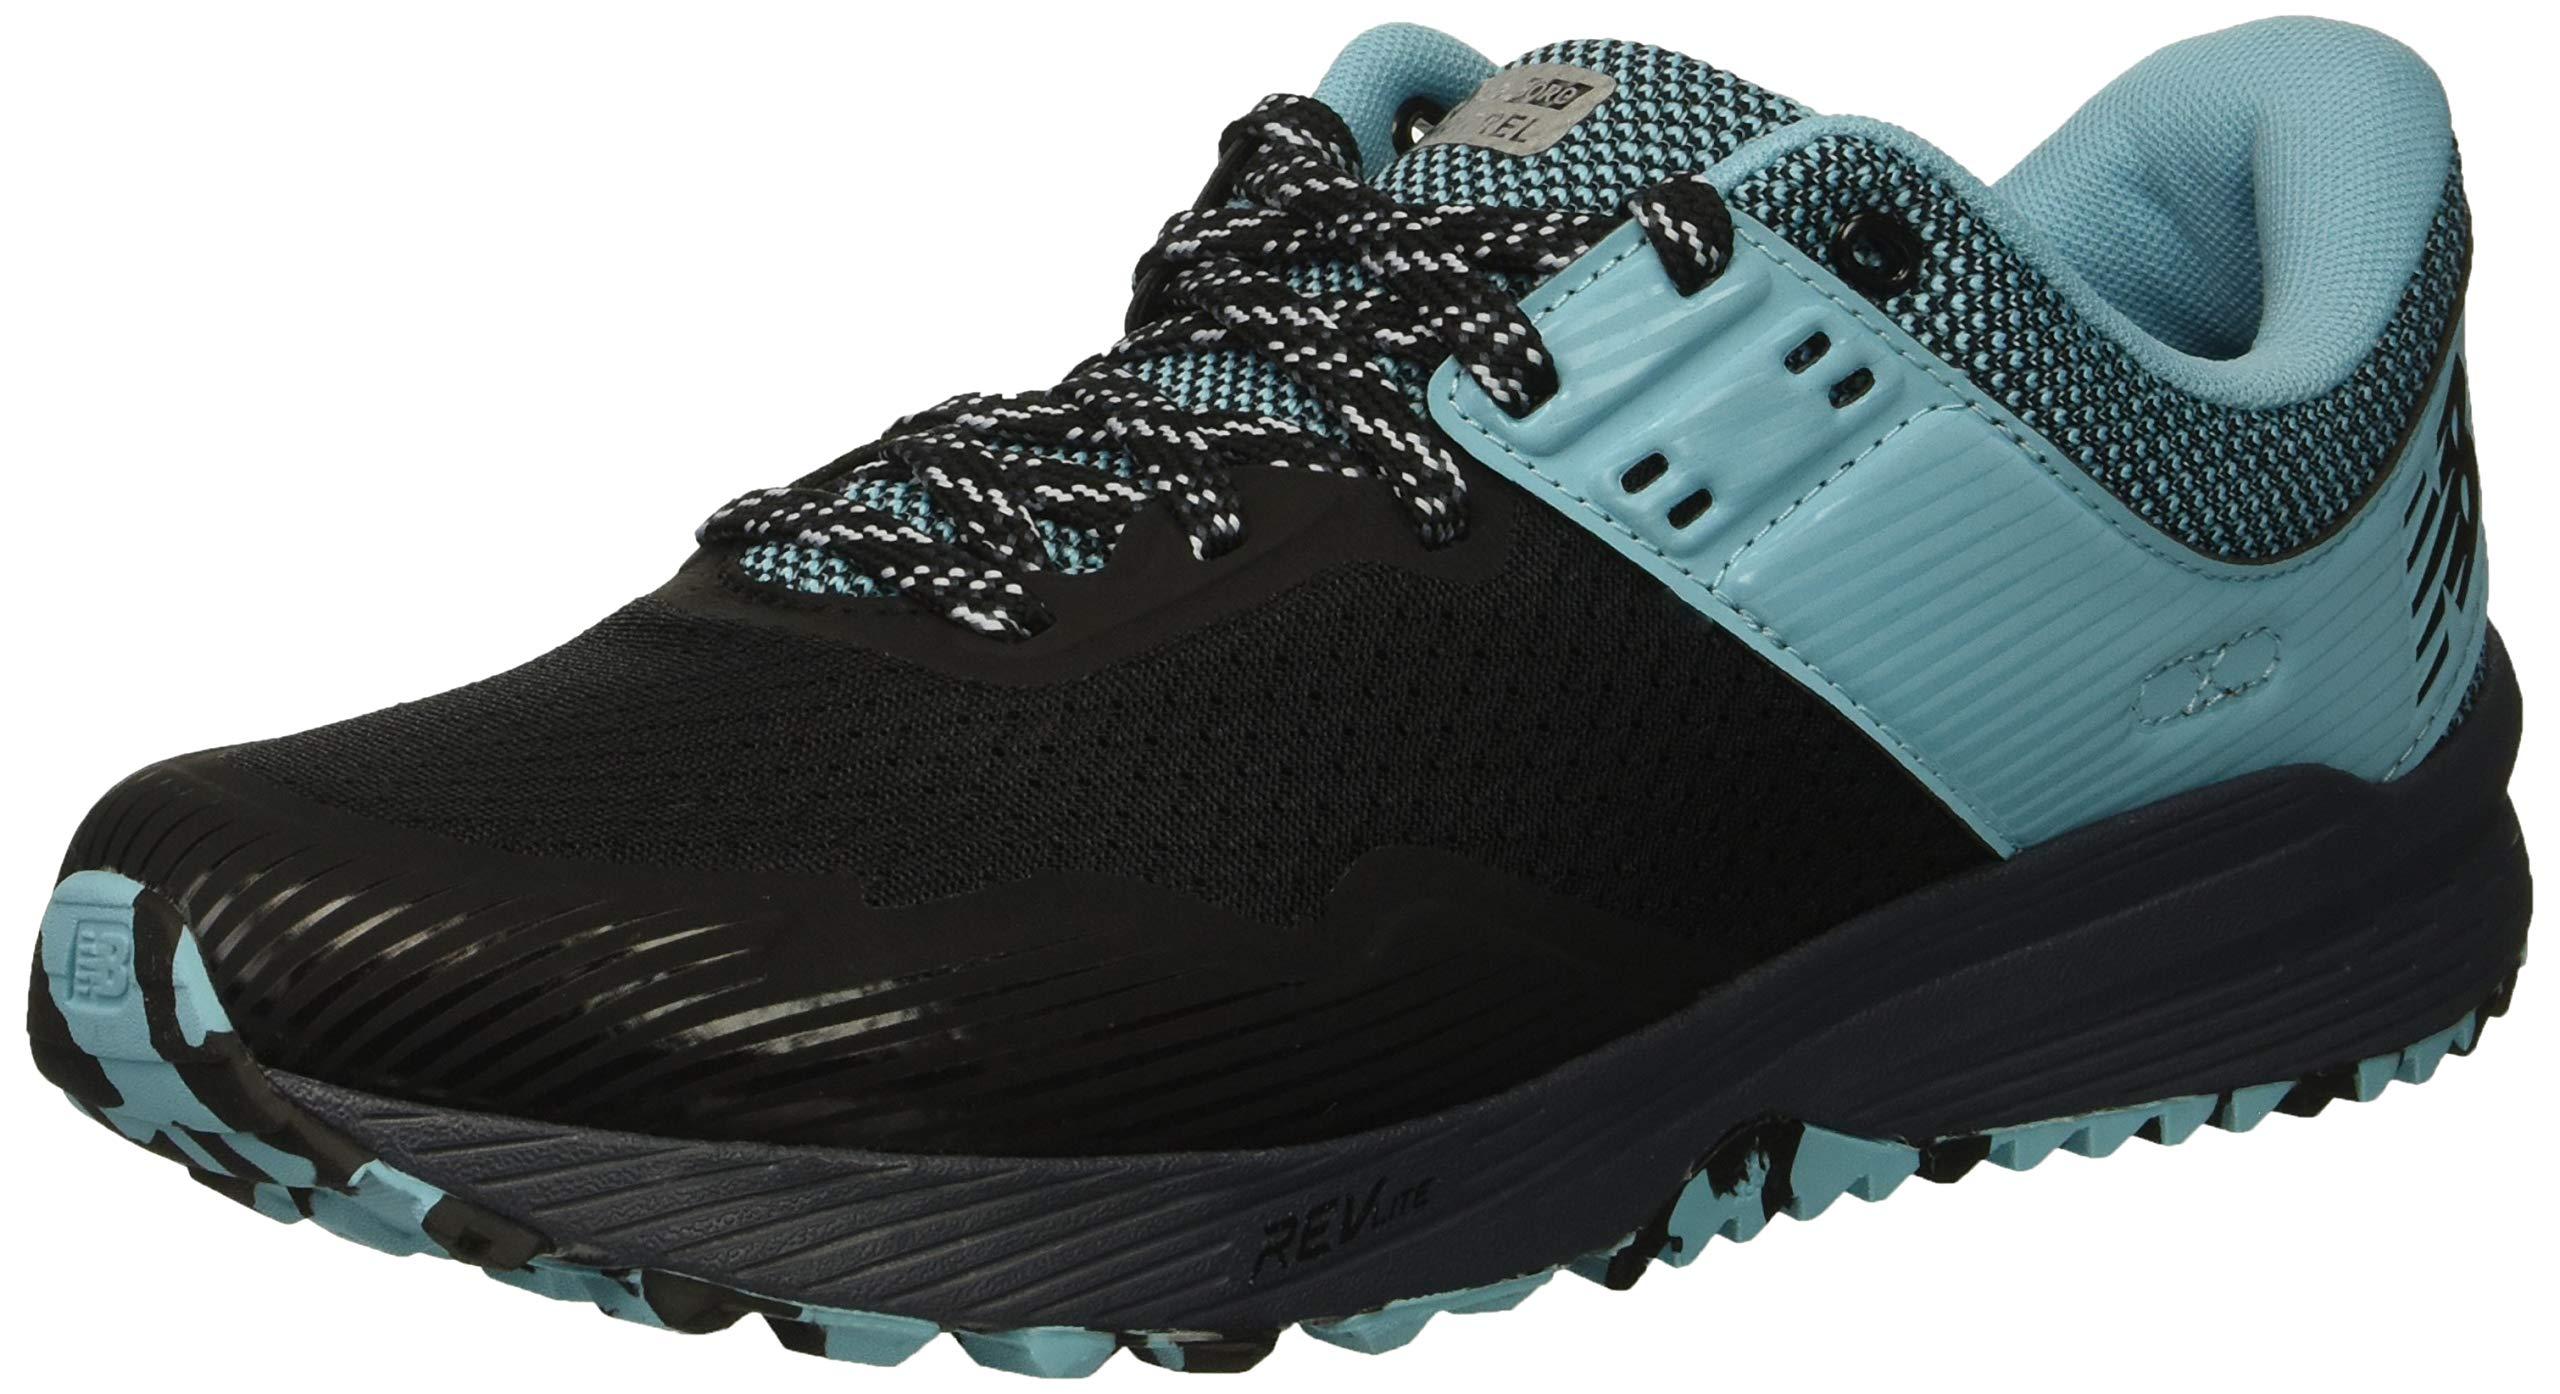 New Balance Women's Nitrel V2 FuelCore Trail Running Shoe Black/Thunder/Enamel Blue 5 B US by New Balance (Image #1)